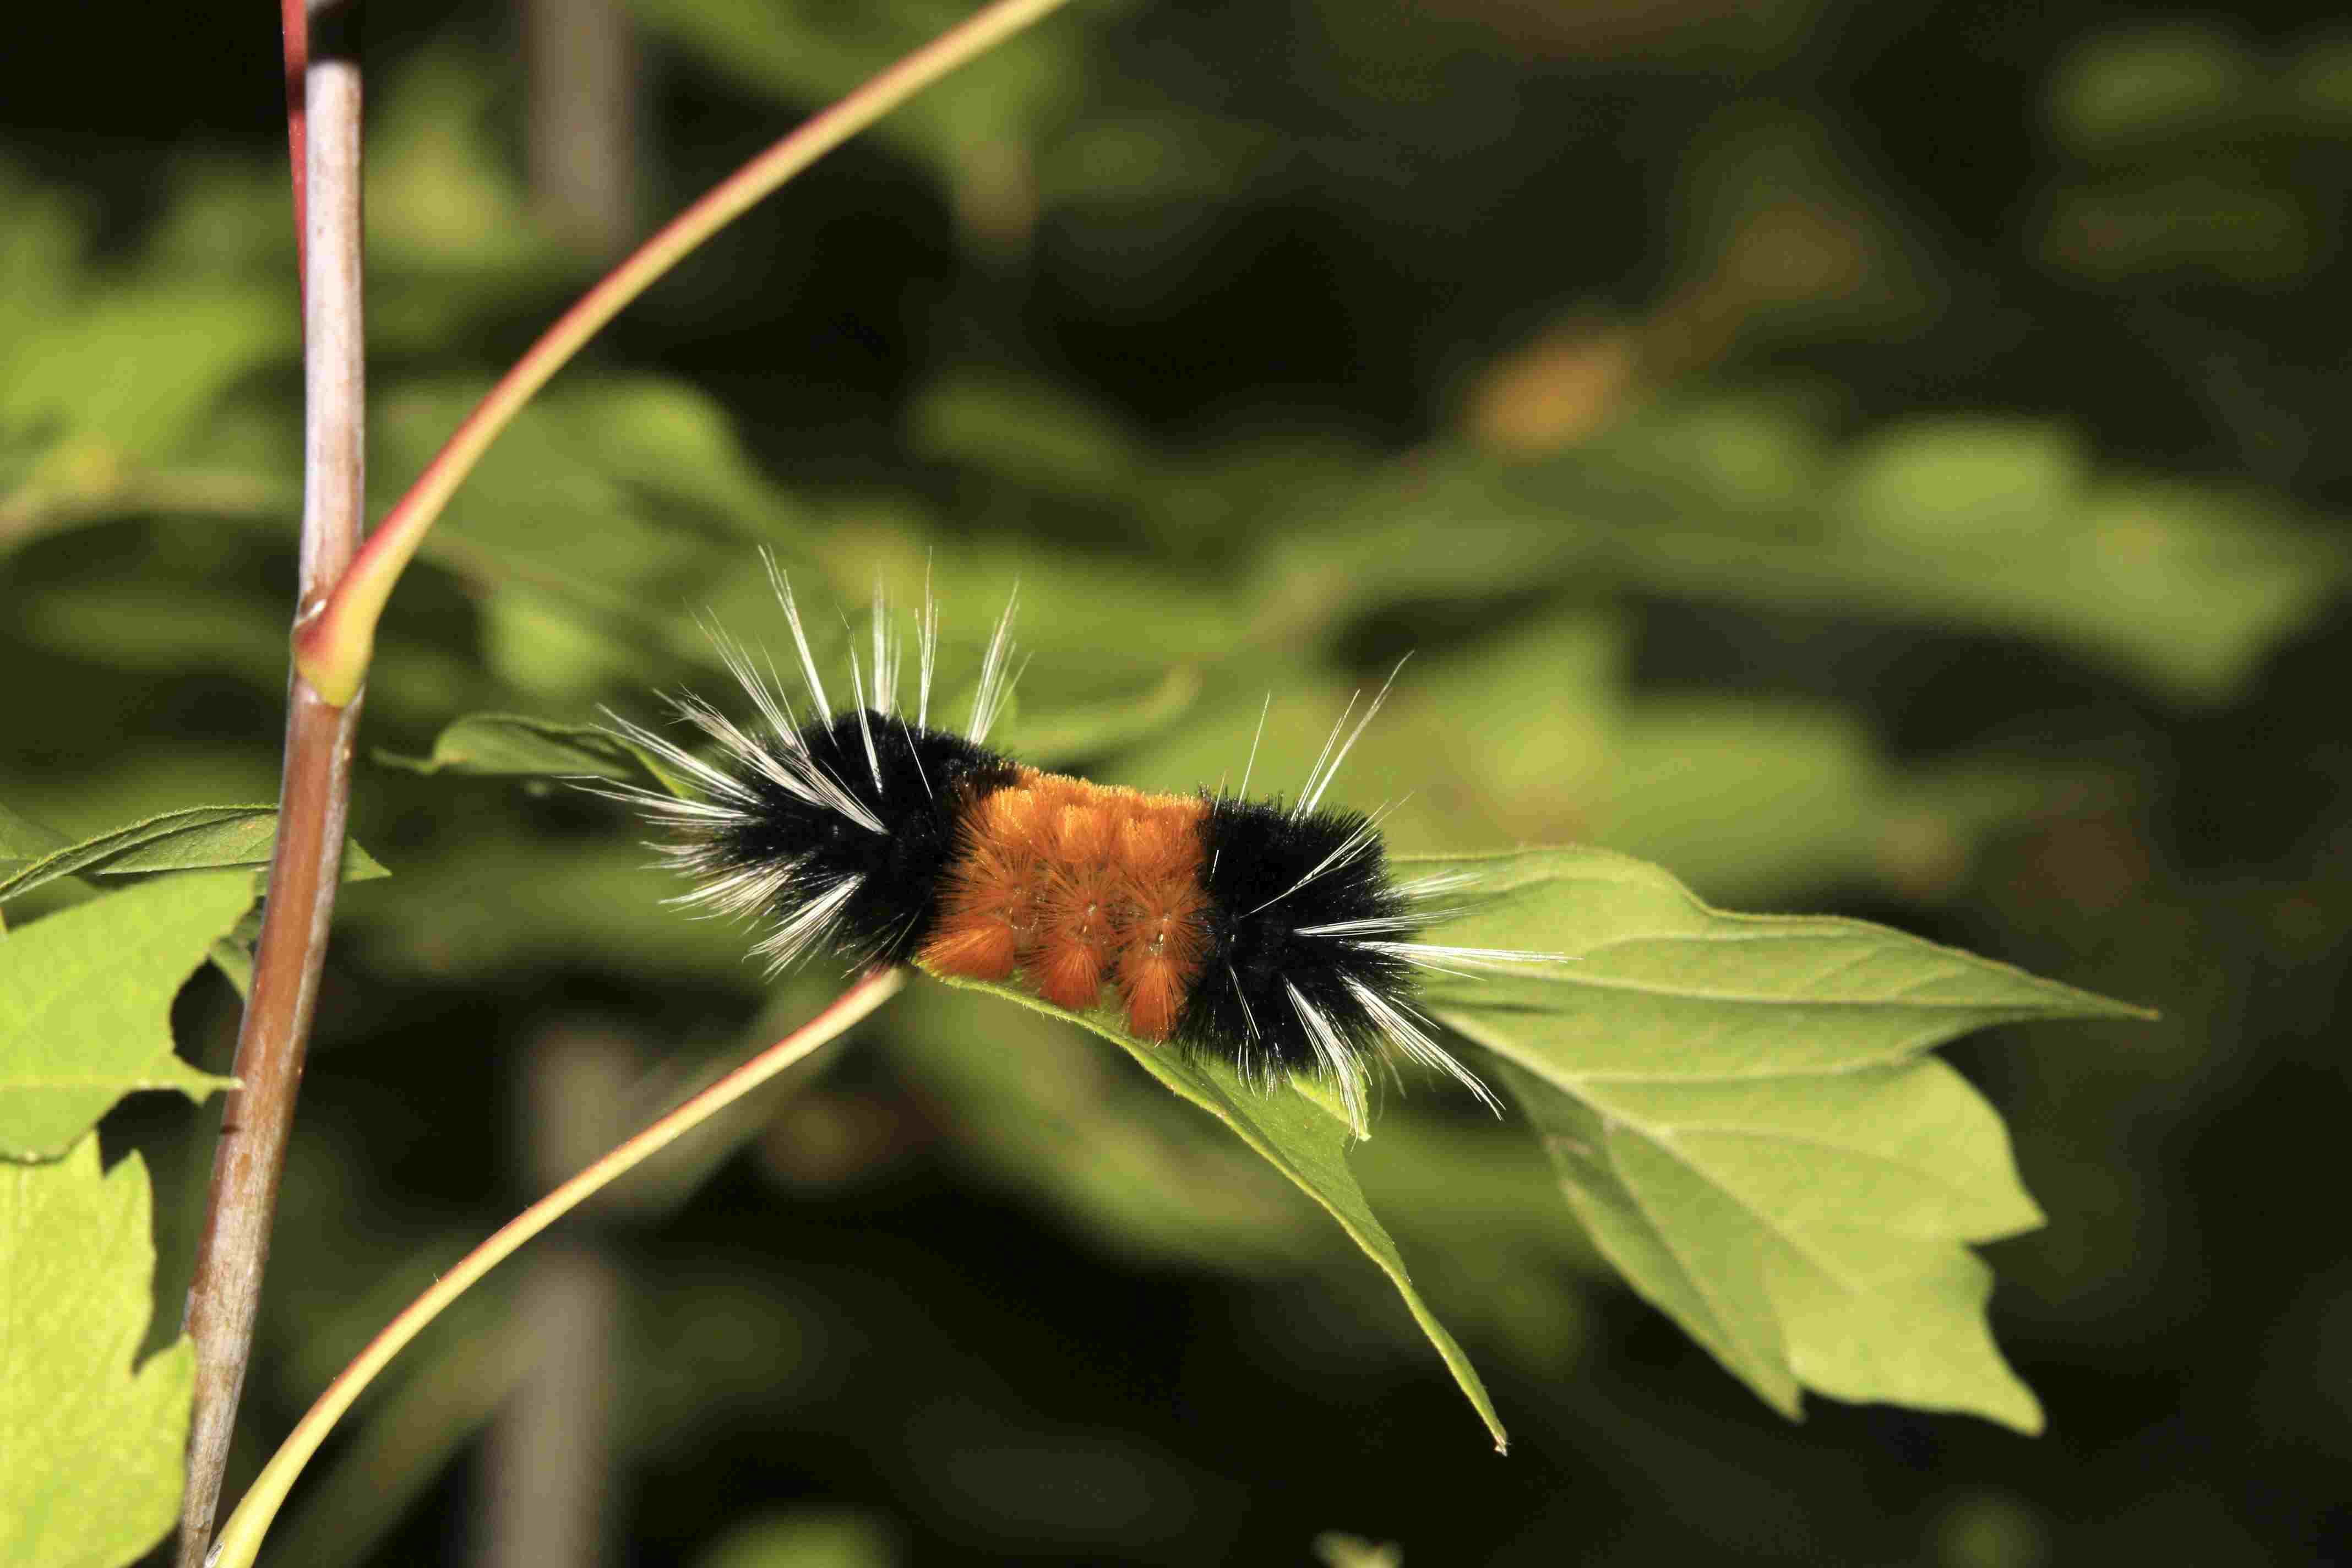 Woolly bear caterpillar moth (Isia isabellea) Montana, USA